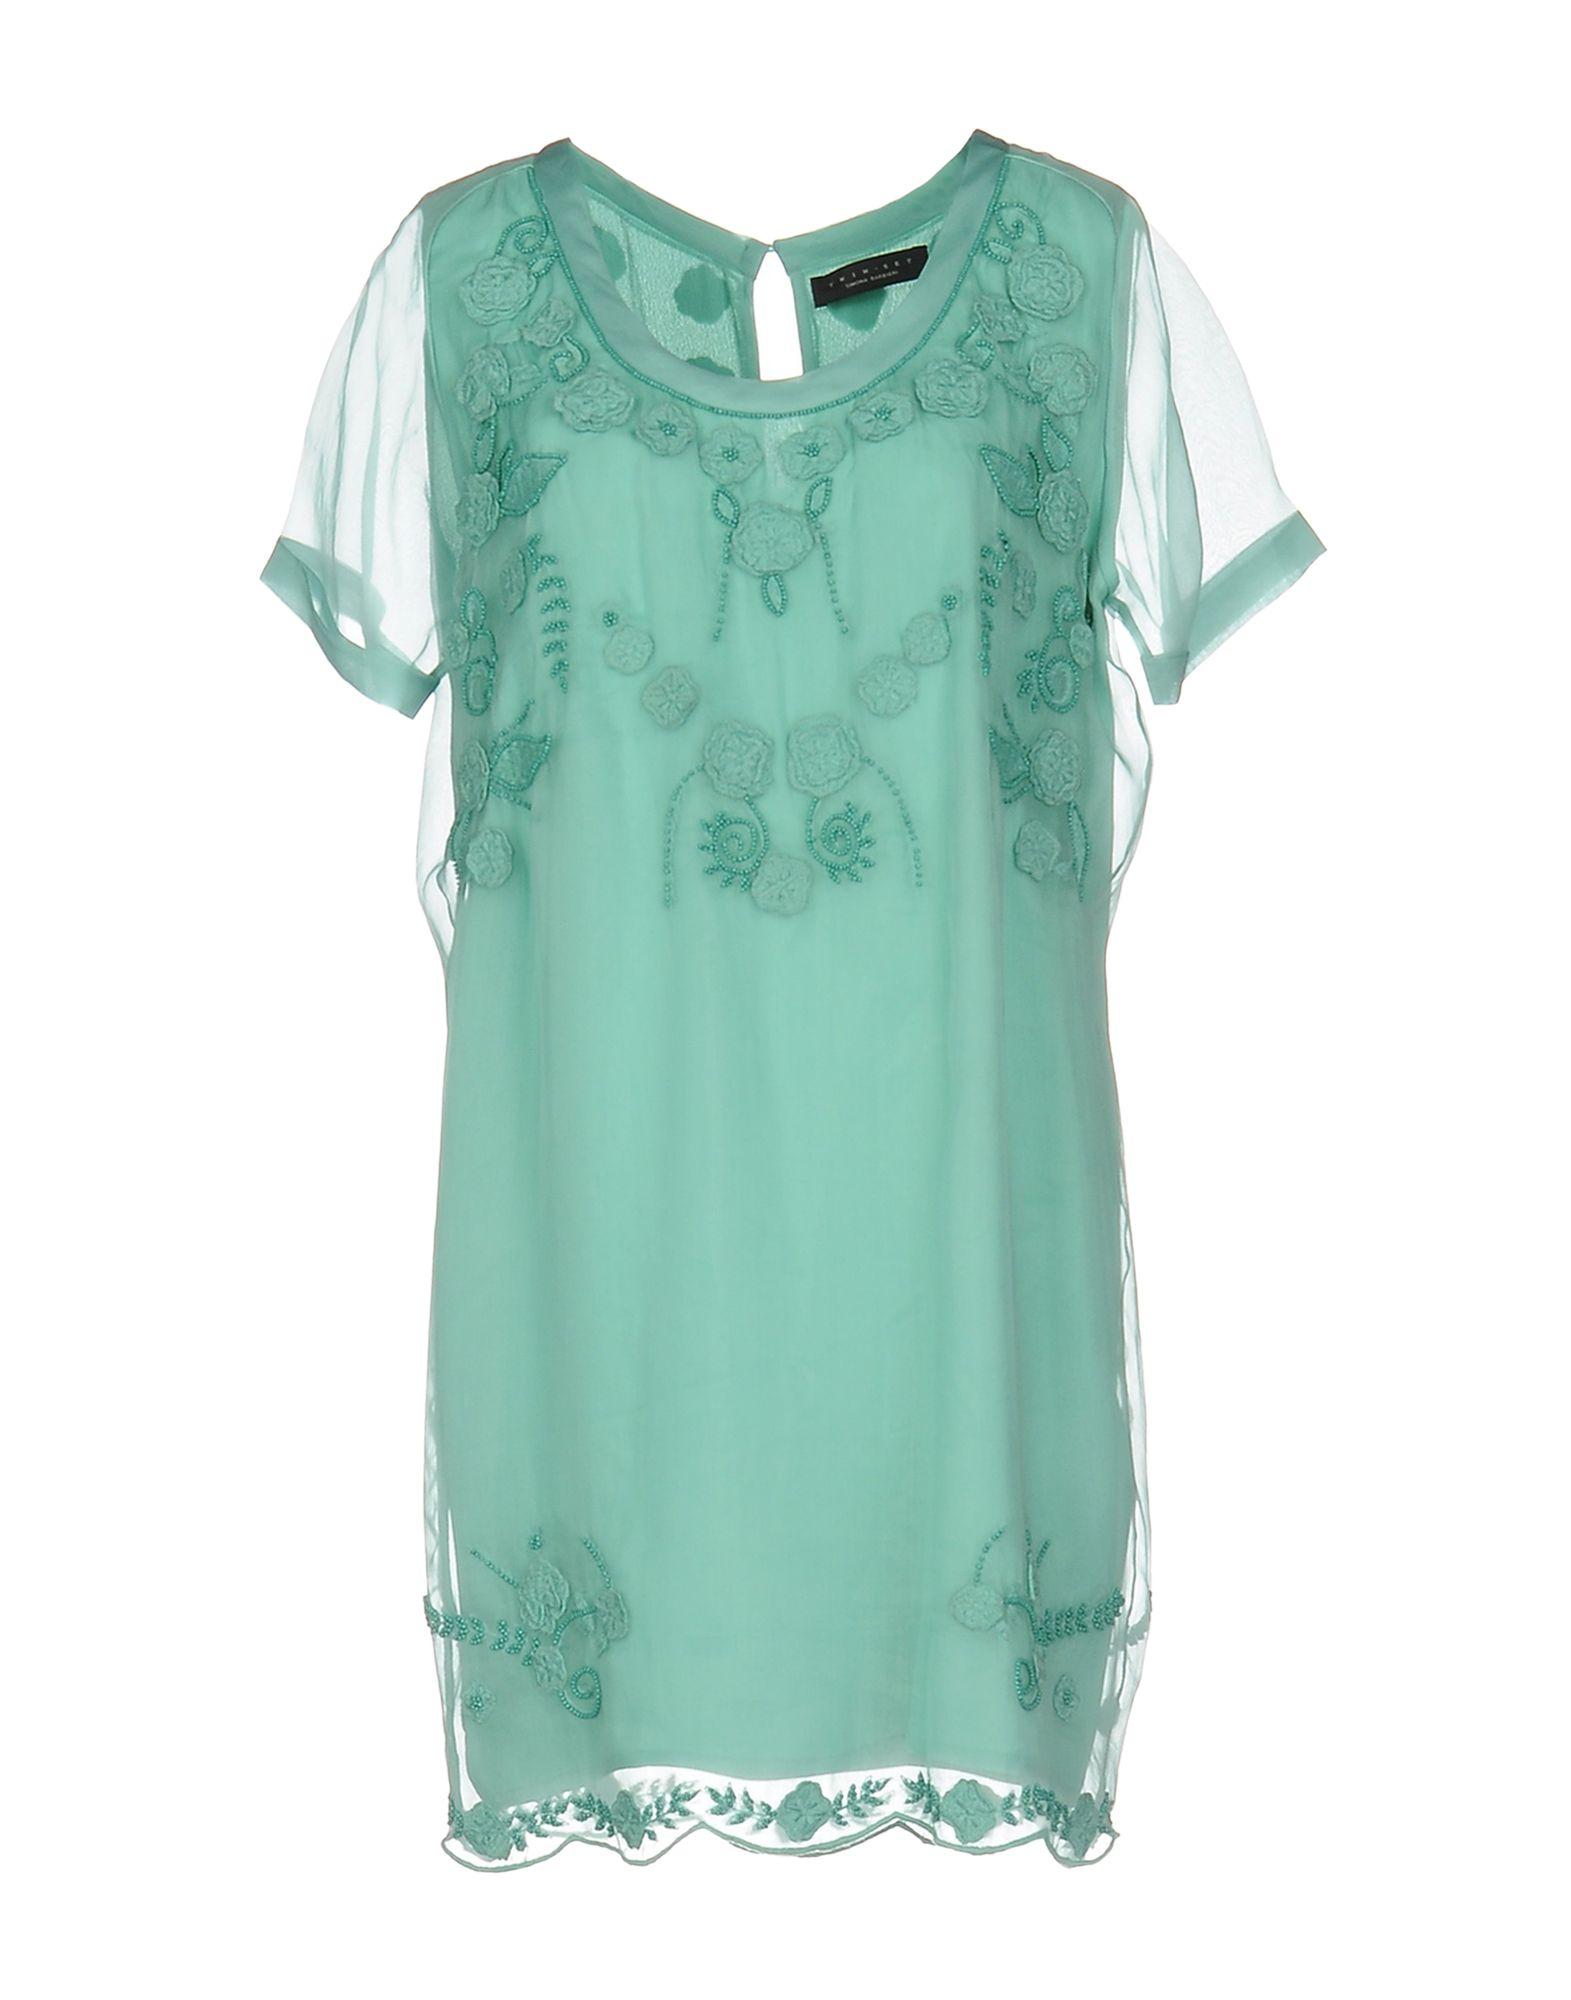 Twin Set Simona Barbieri Sale Dresses Blue Top Women Yoox United States